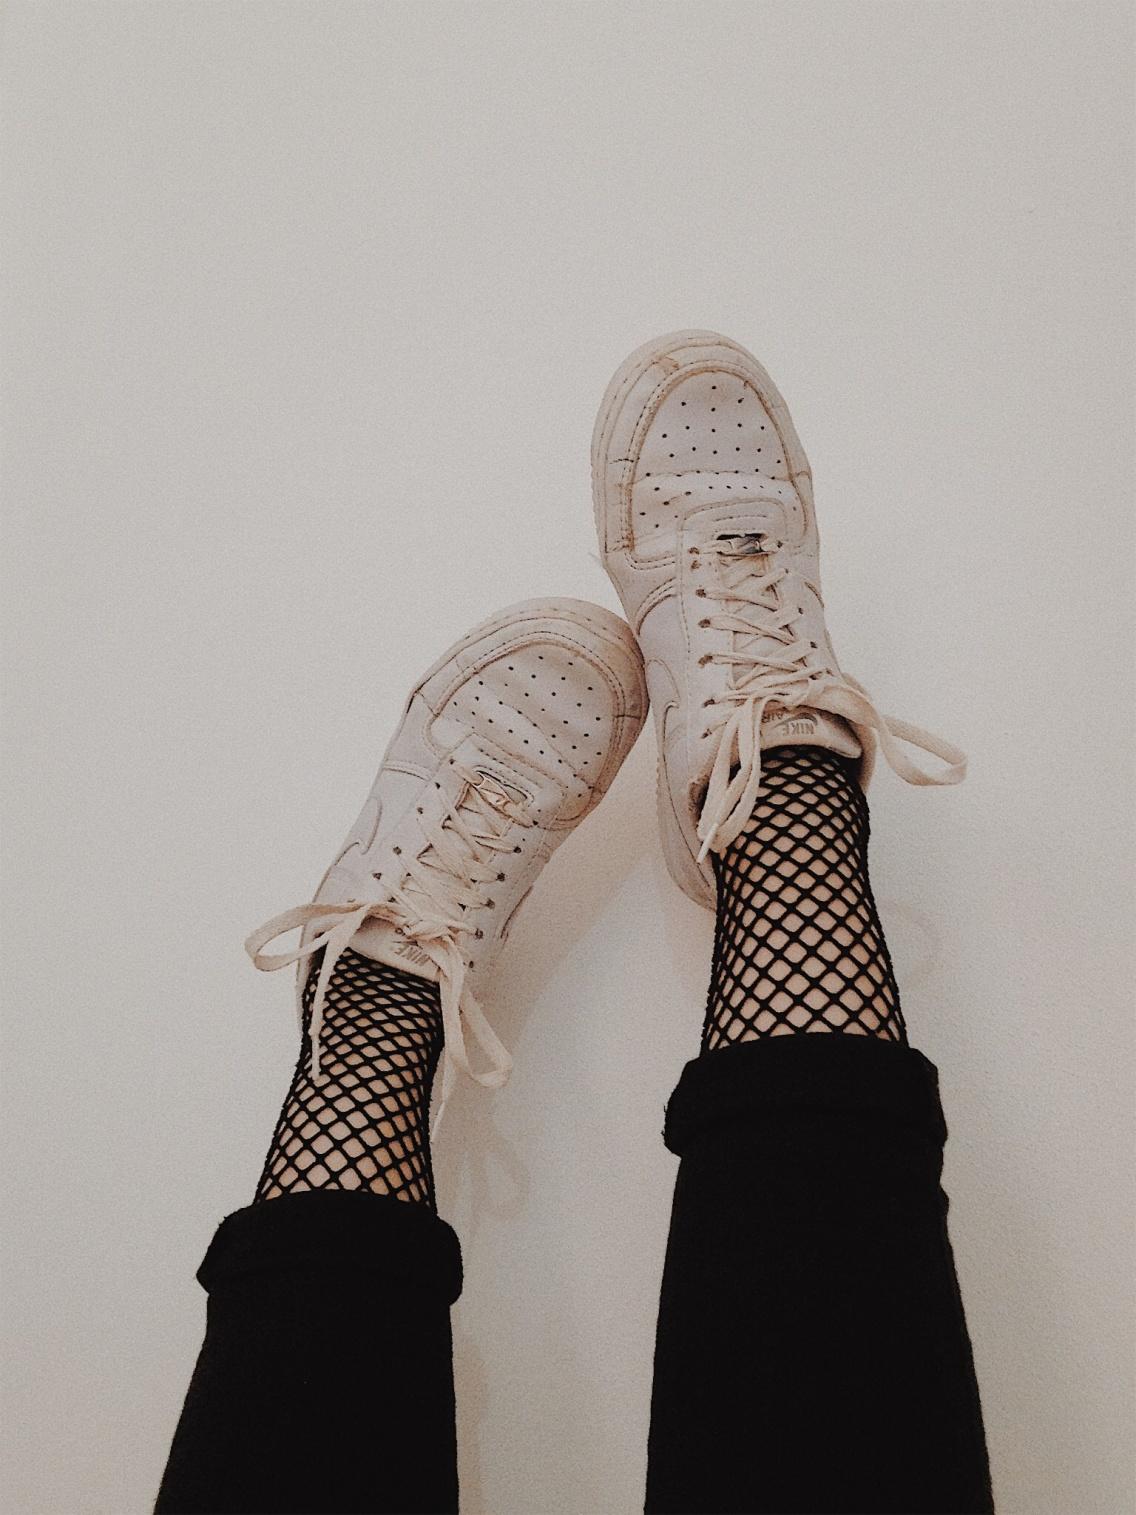 My feet tumblr